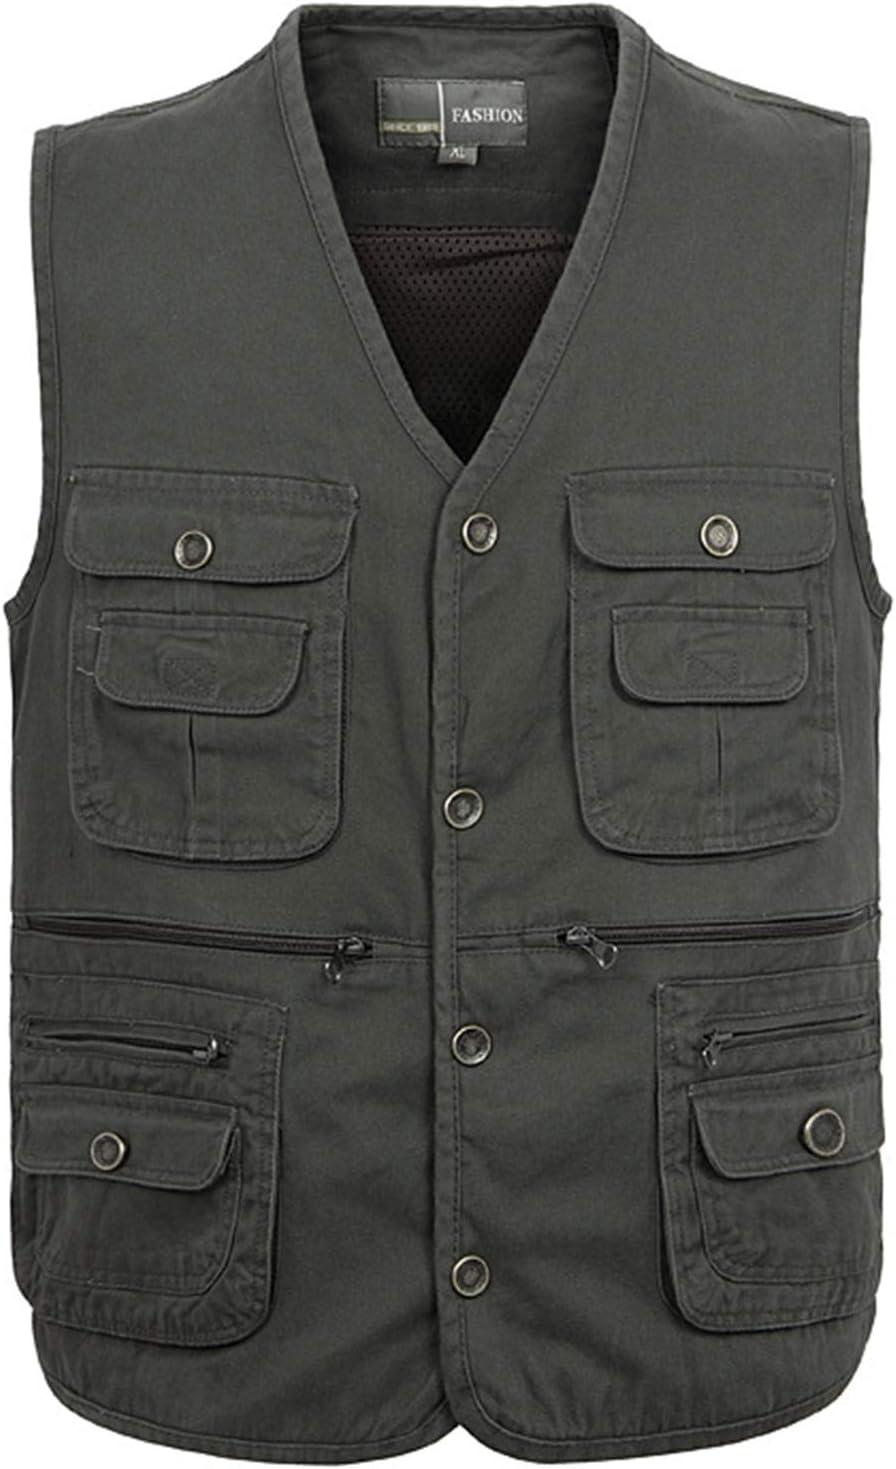 CNBPLS Classic Men Vest Cotton,Button Multi Pocket Sleeveless Jacket,Solid Big Size Travel Waistcoat,Dark Army Green,2XL